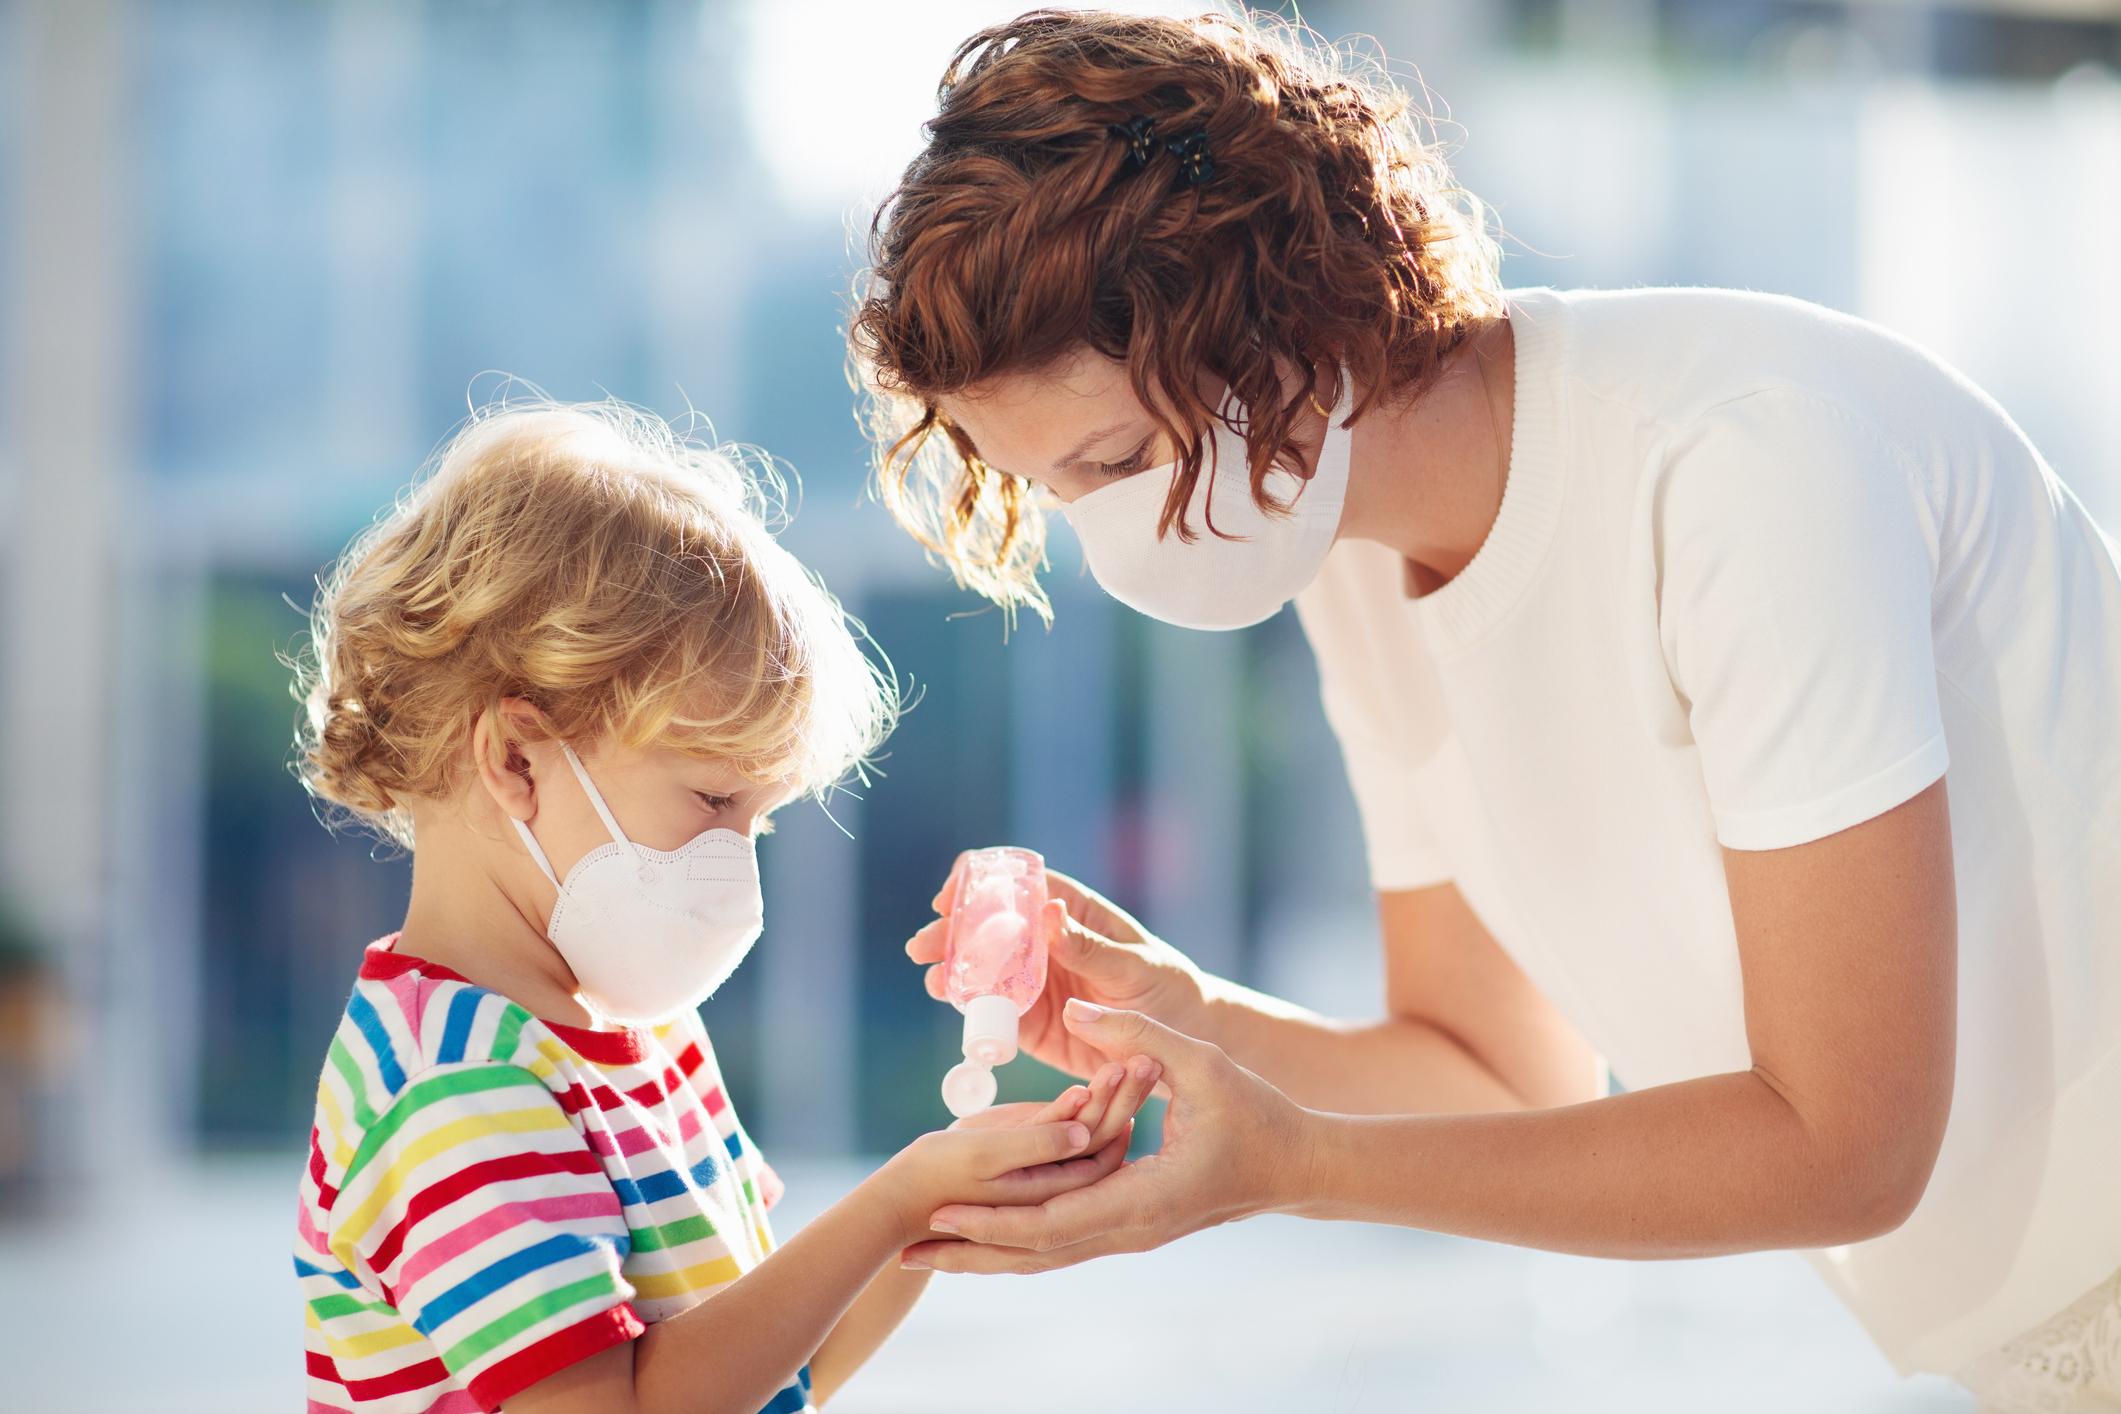 【COVID-19】新型コロナウイルス感染症予防対策 日本ACLS協会の取組み